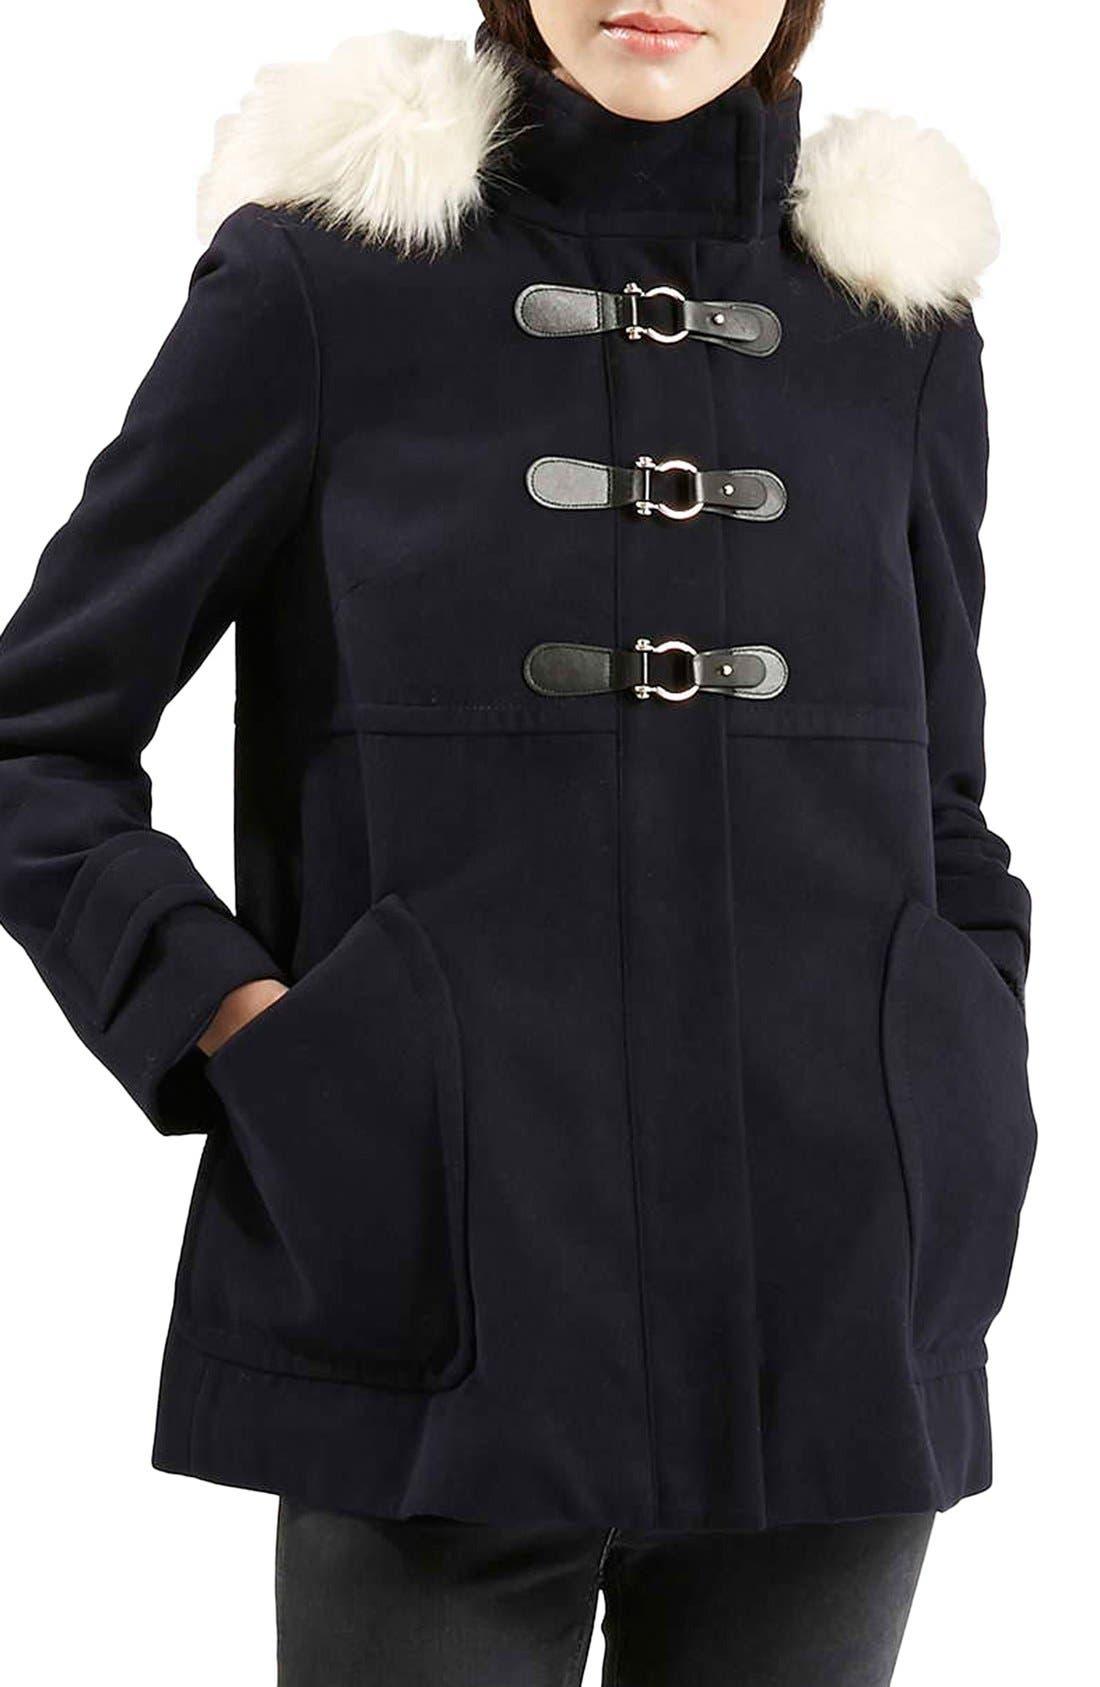 Alternate Image 1 Selected - Topshop 'Hattie' Faux Fur Trim DuffleCoat